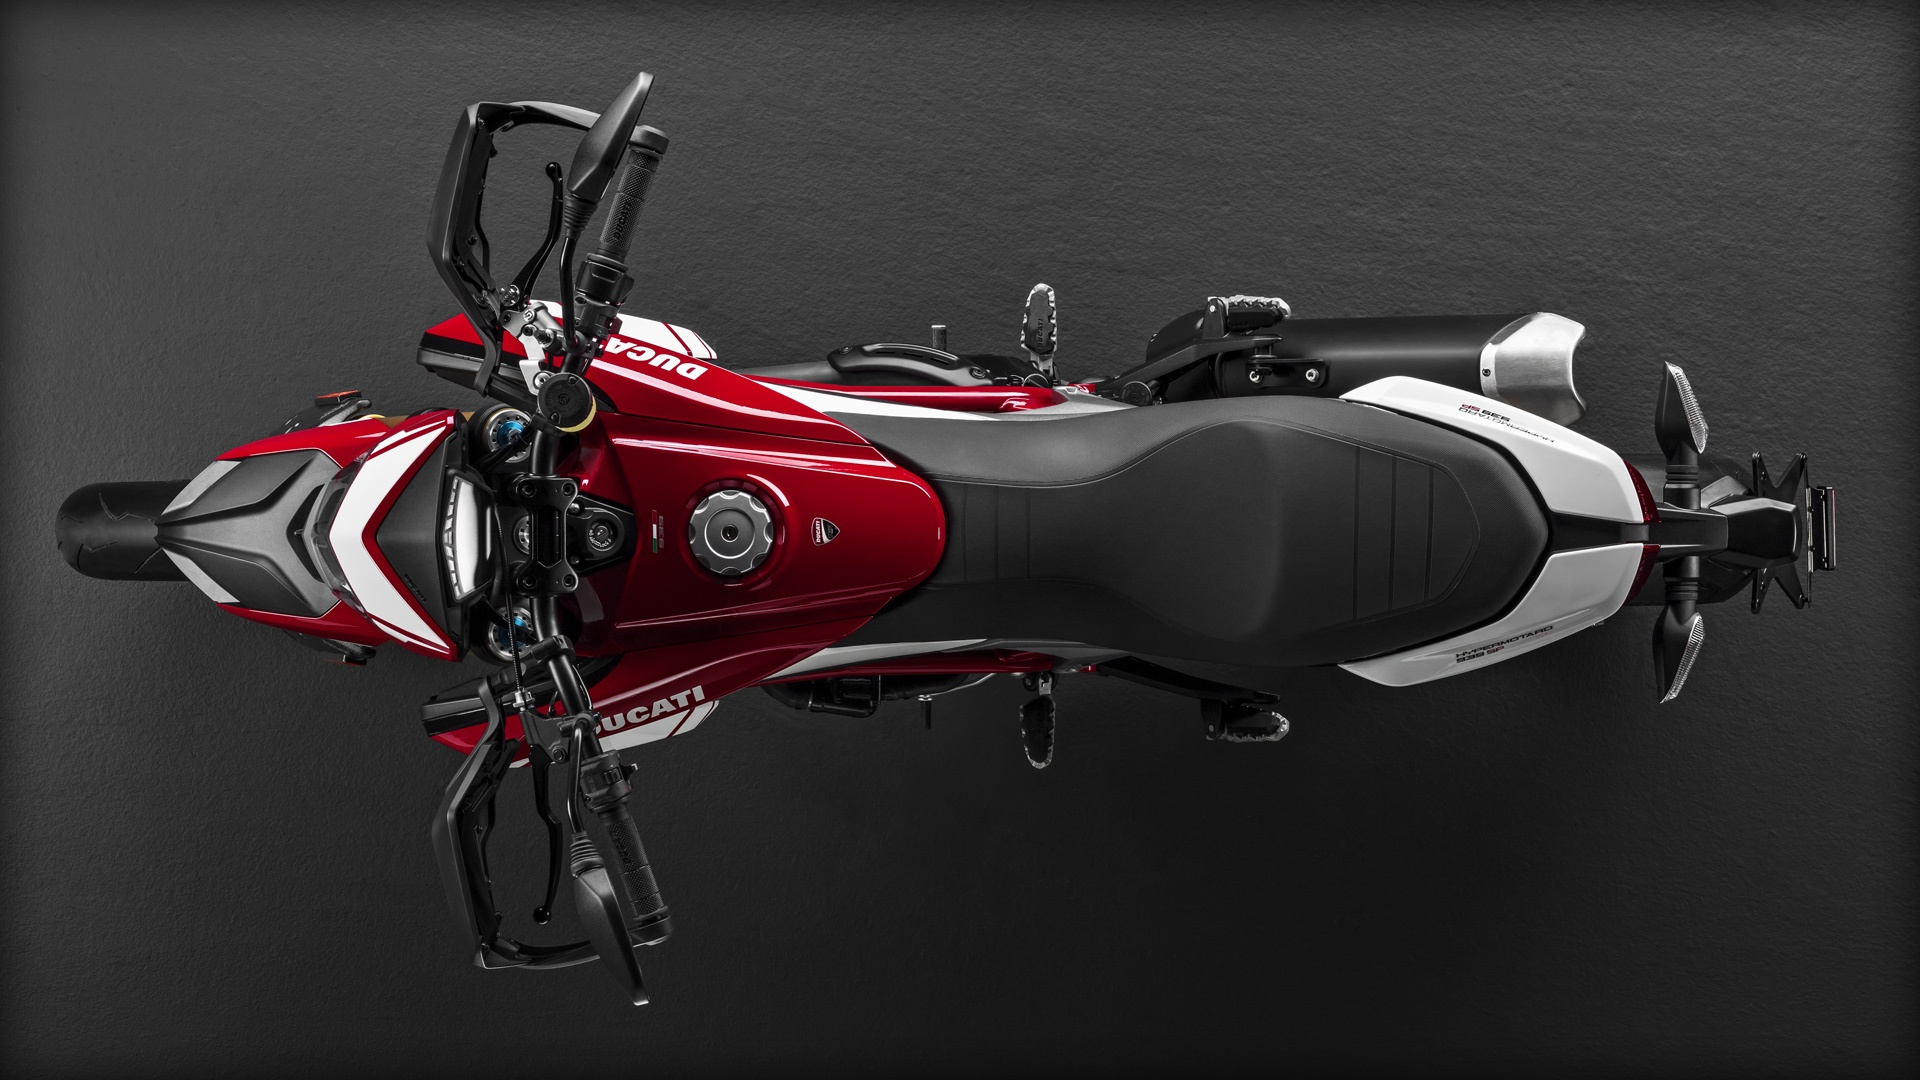 Ducati Hypermotard Evo Sp For Sale